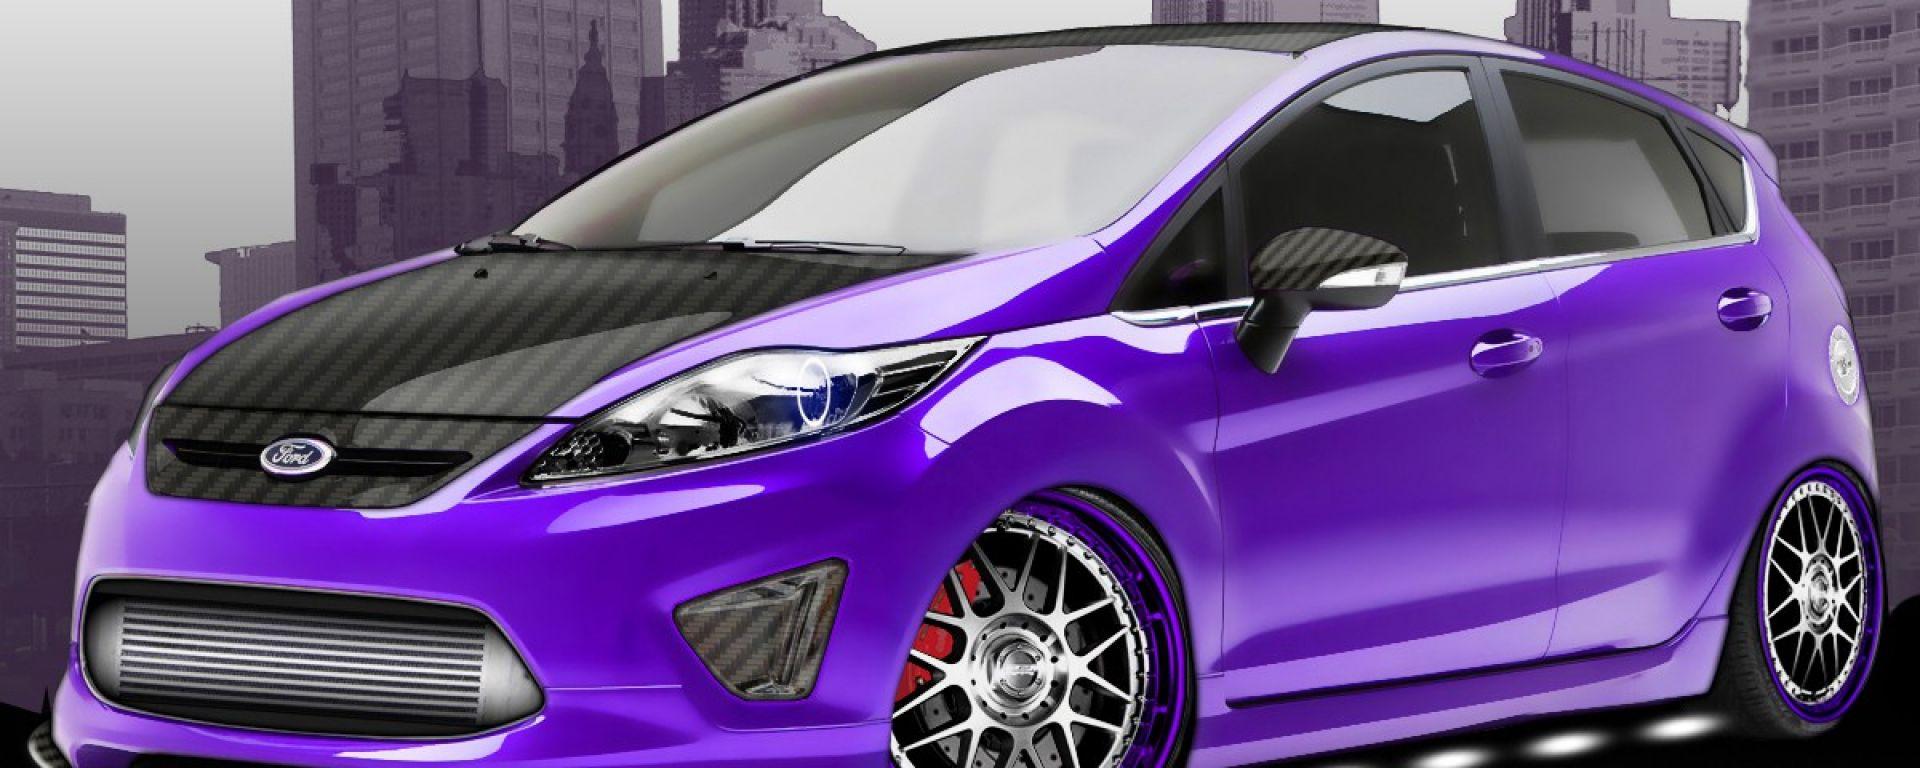 Sema 2011: così Ford incattivisce Focus e Fiesta